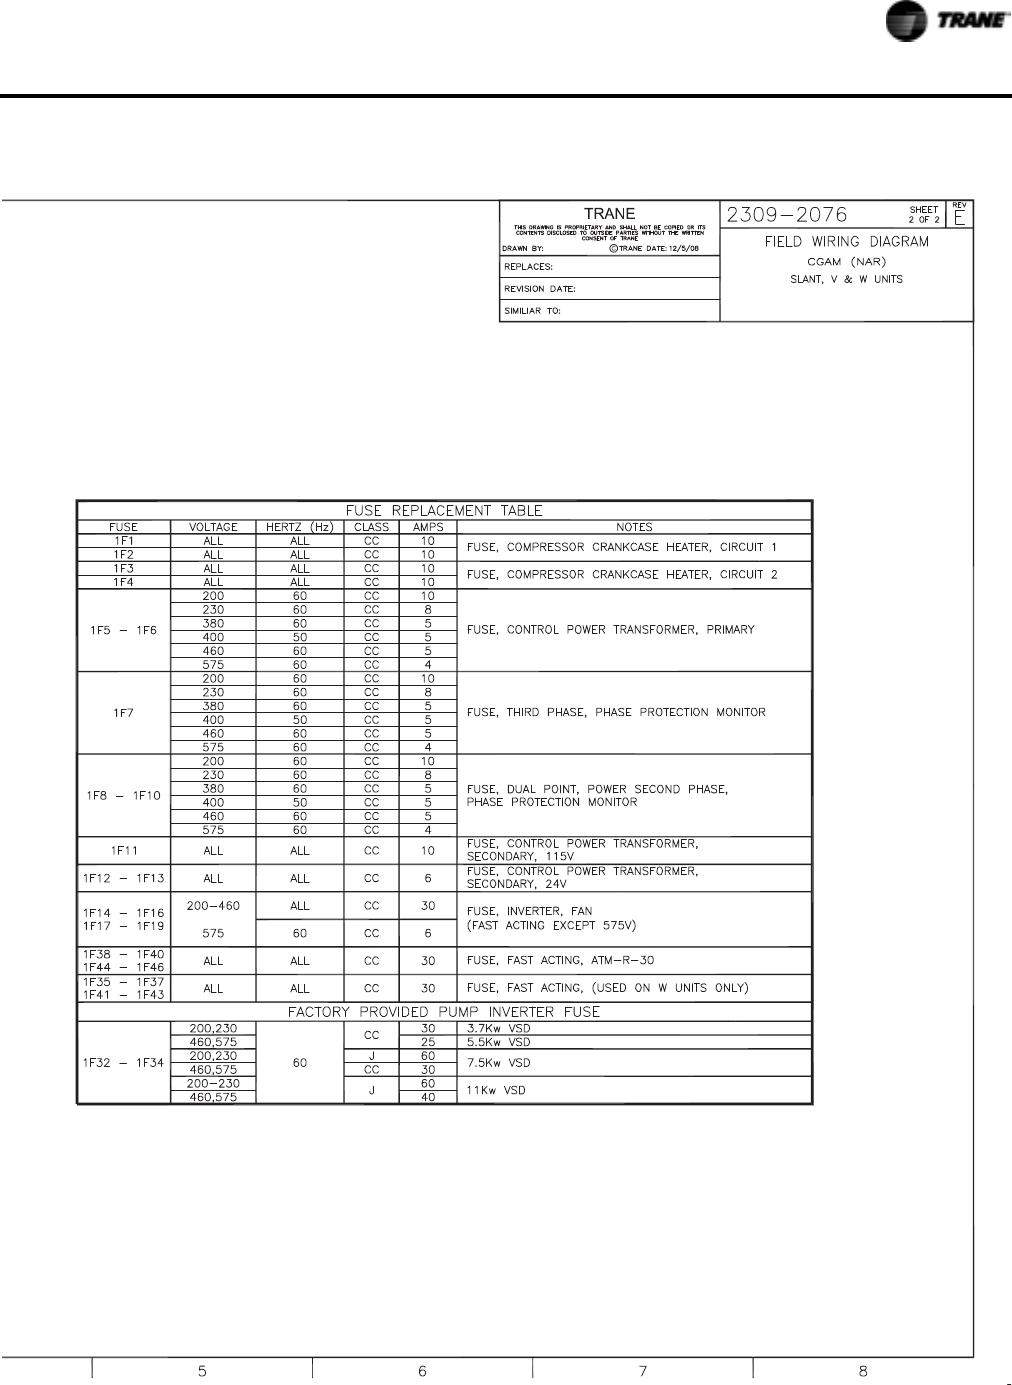 Schematic Wiring Trane Cgam 100 Wallpaper Hvac Dampers Rauc Diagram Scroll Catalogue Cg Prc017h En 02 2015 On